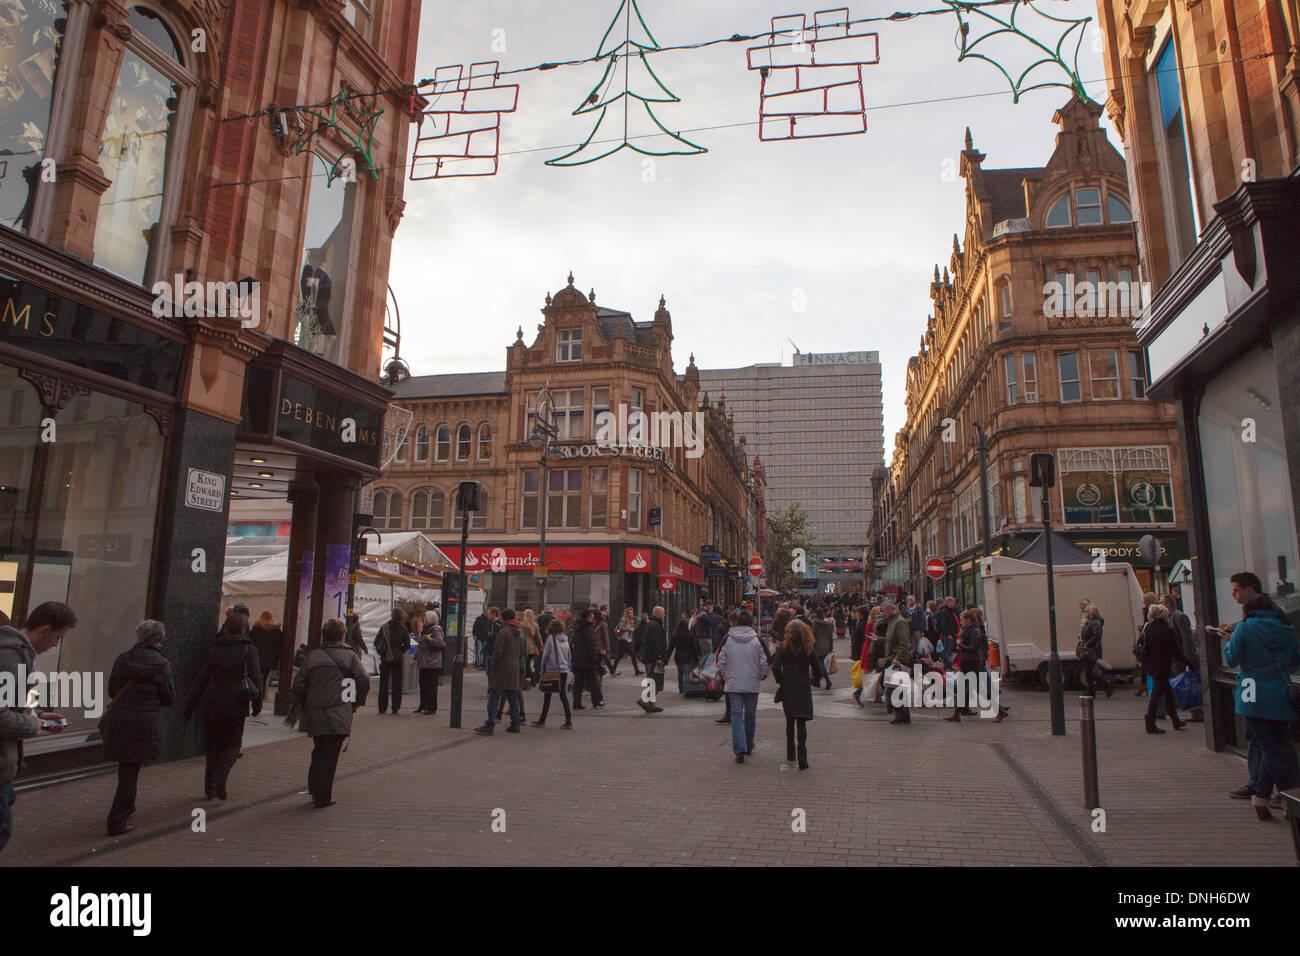 Leeds city centre high street at dusk - Stock Image